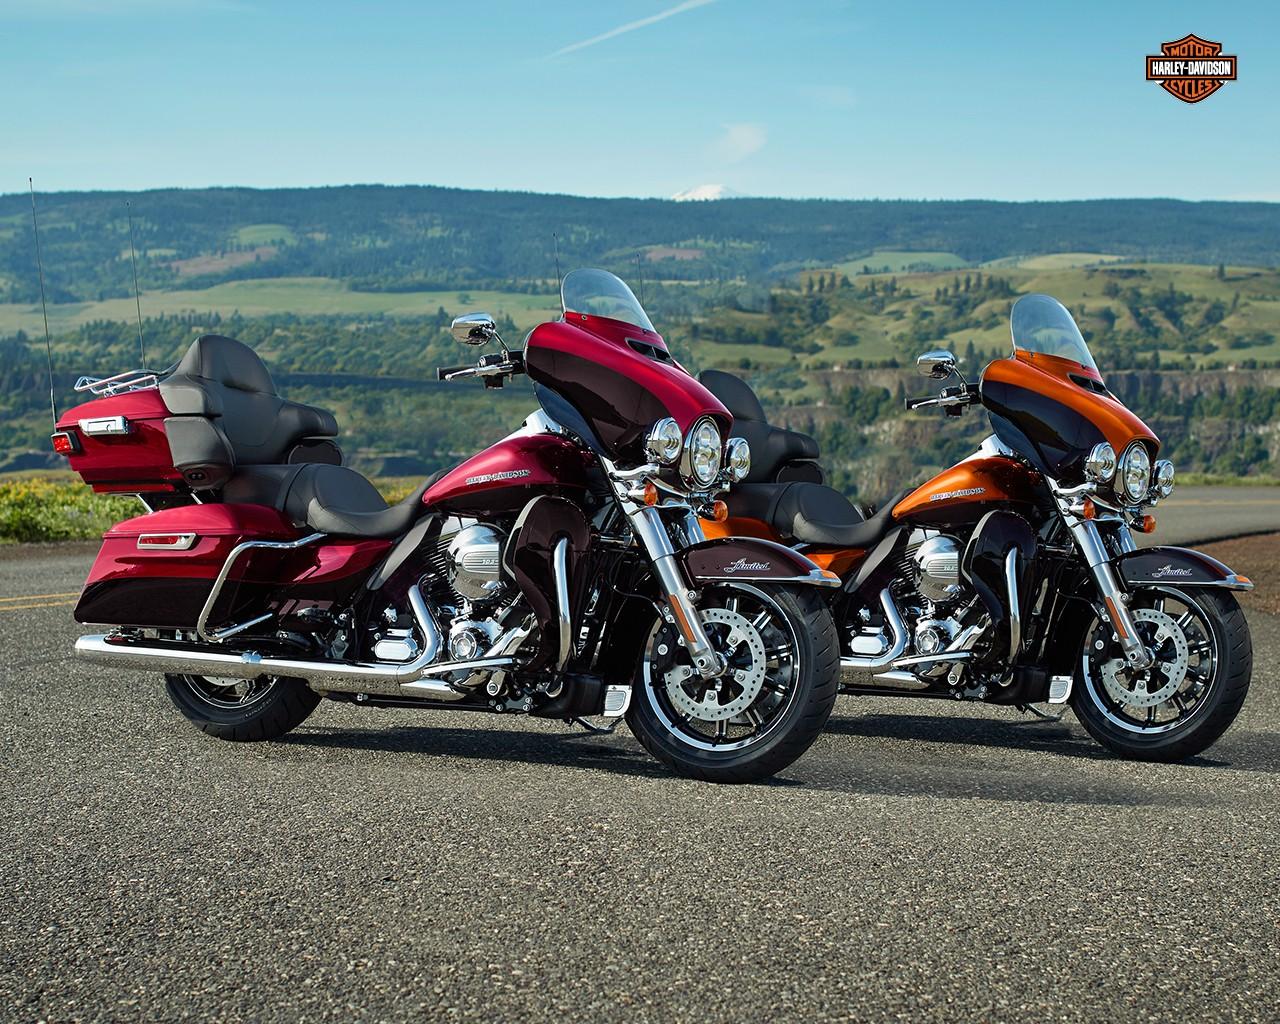 Harley Davidson: Behold The 2015 Harley-Davidson Ultra Limited & Low